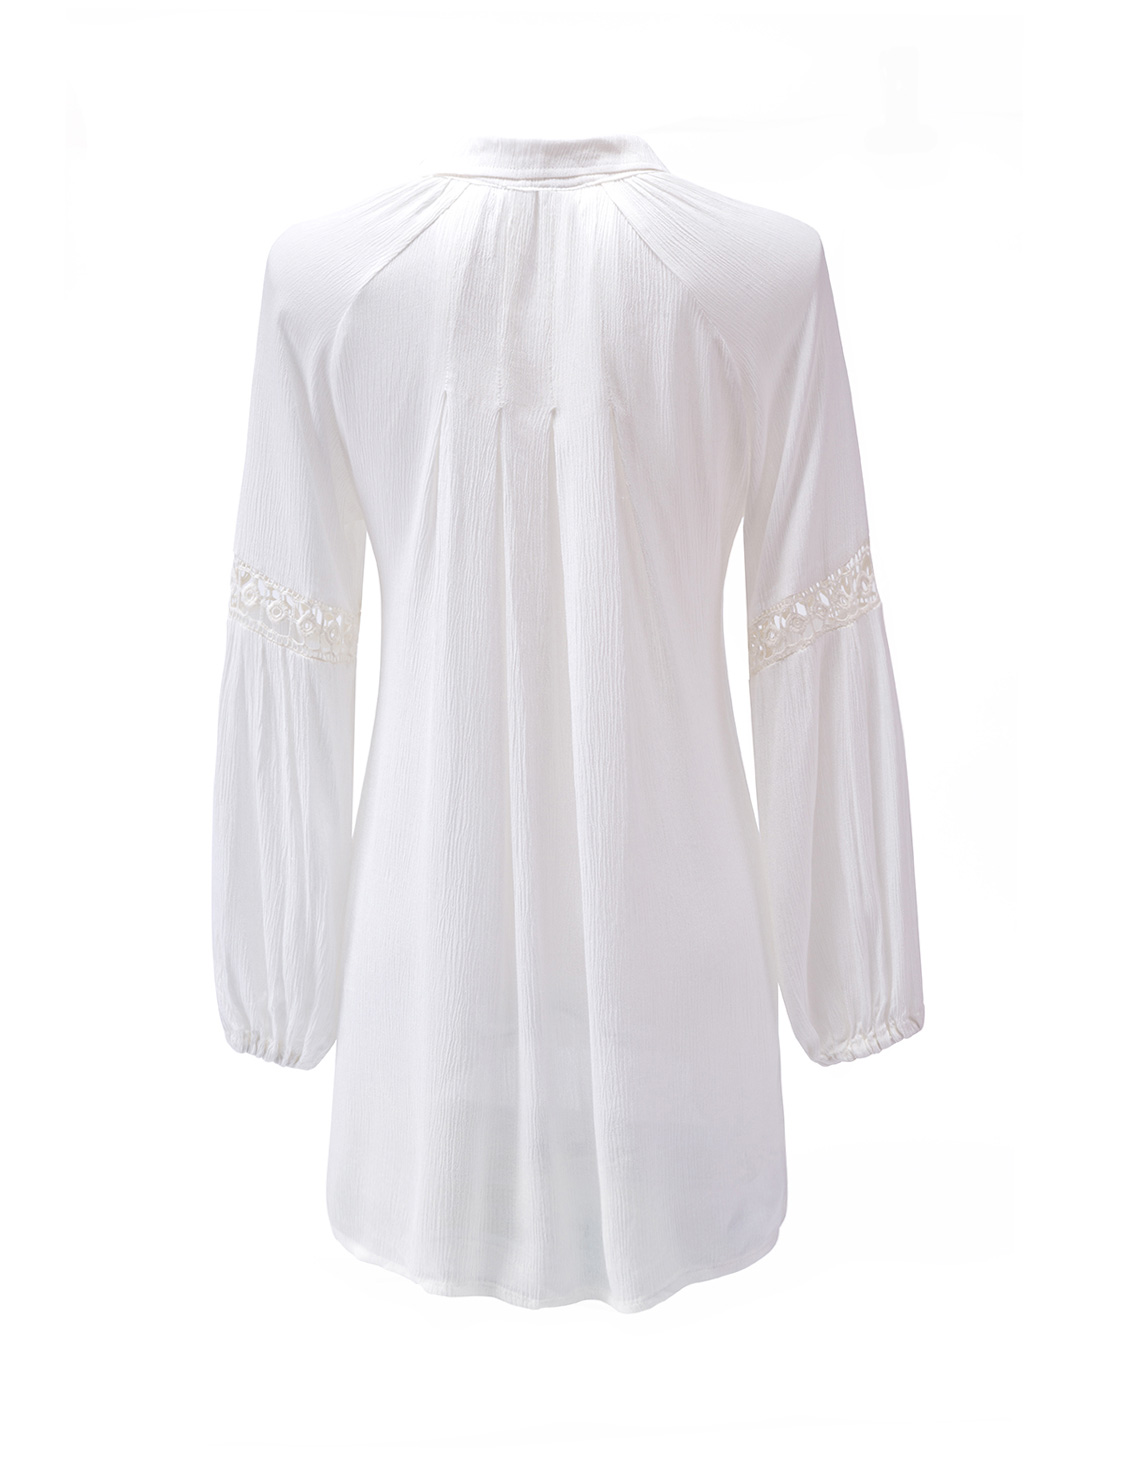 Белая блузка вискоза